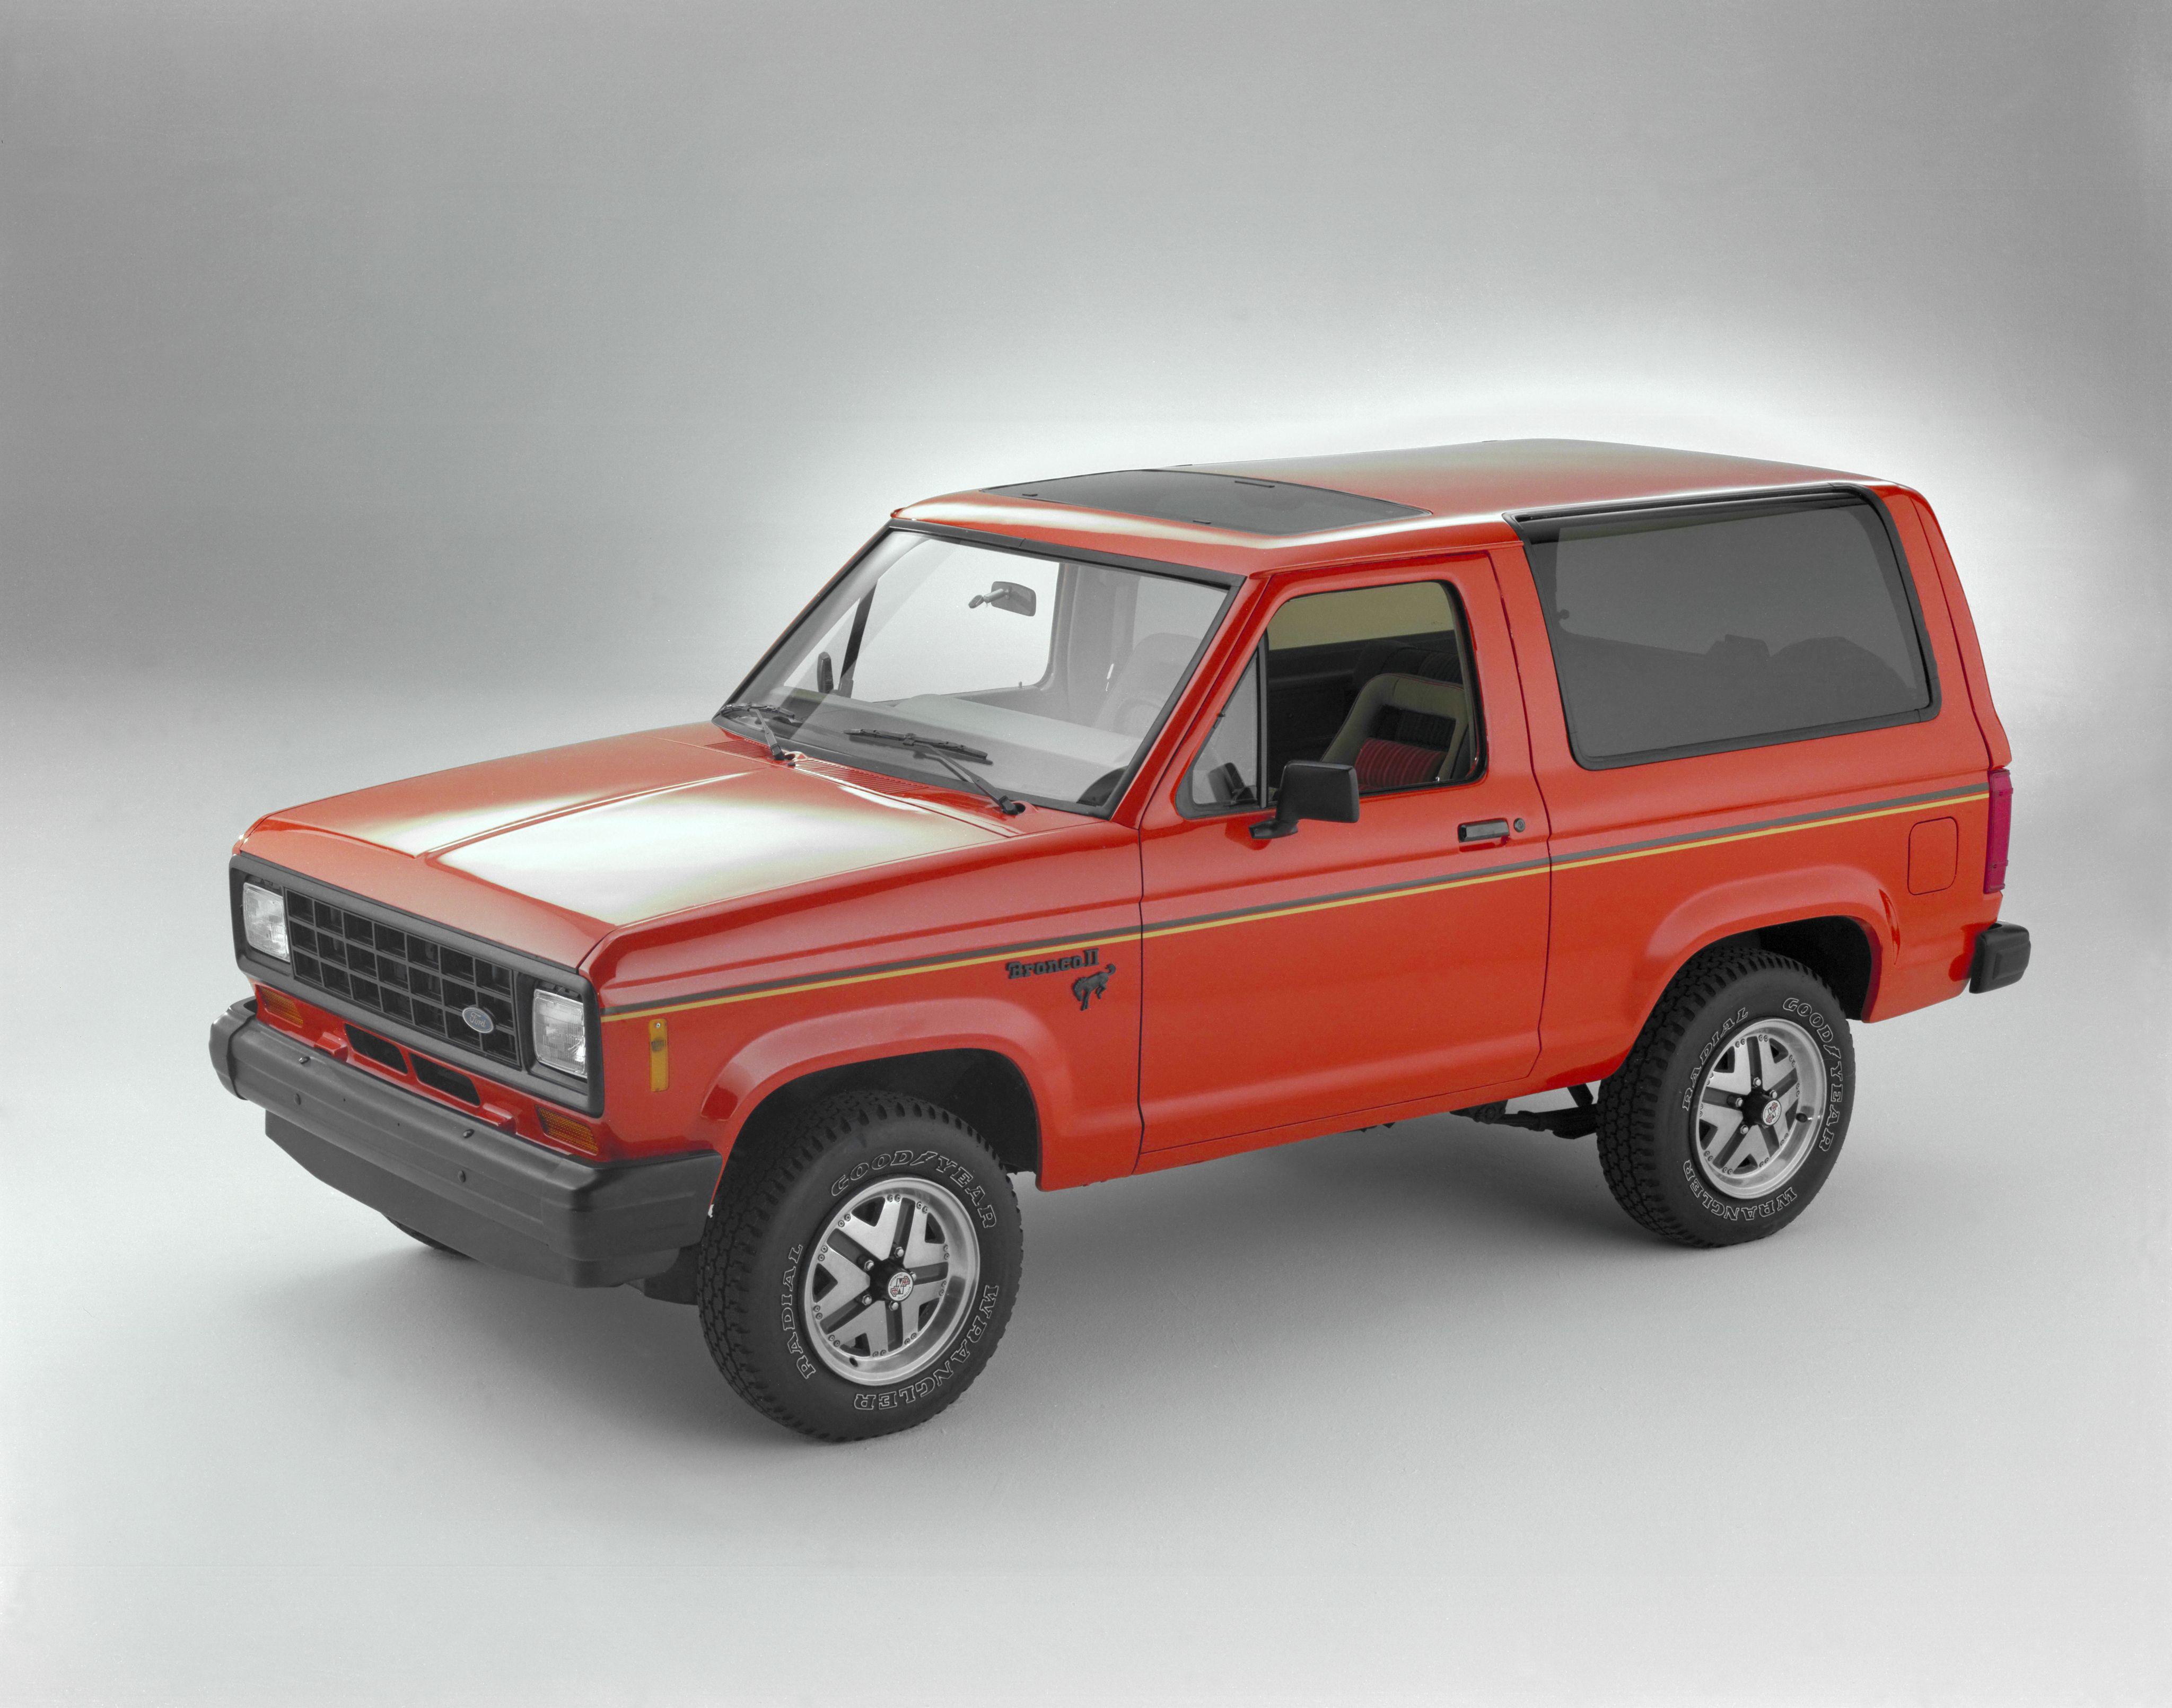 1984 Ford Bronco Ii Ford Bronco Bronco Ii Ford Bronco Ii